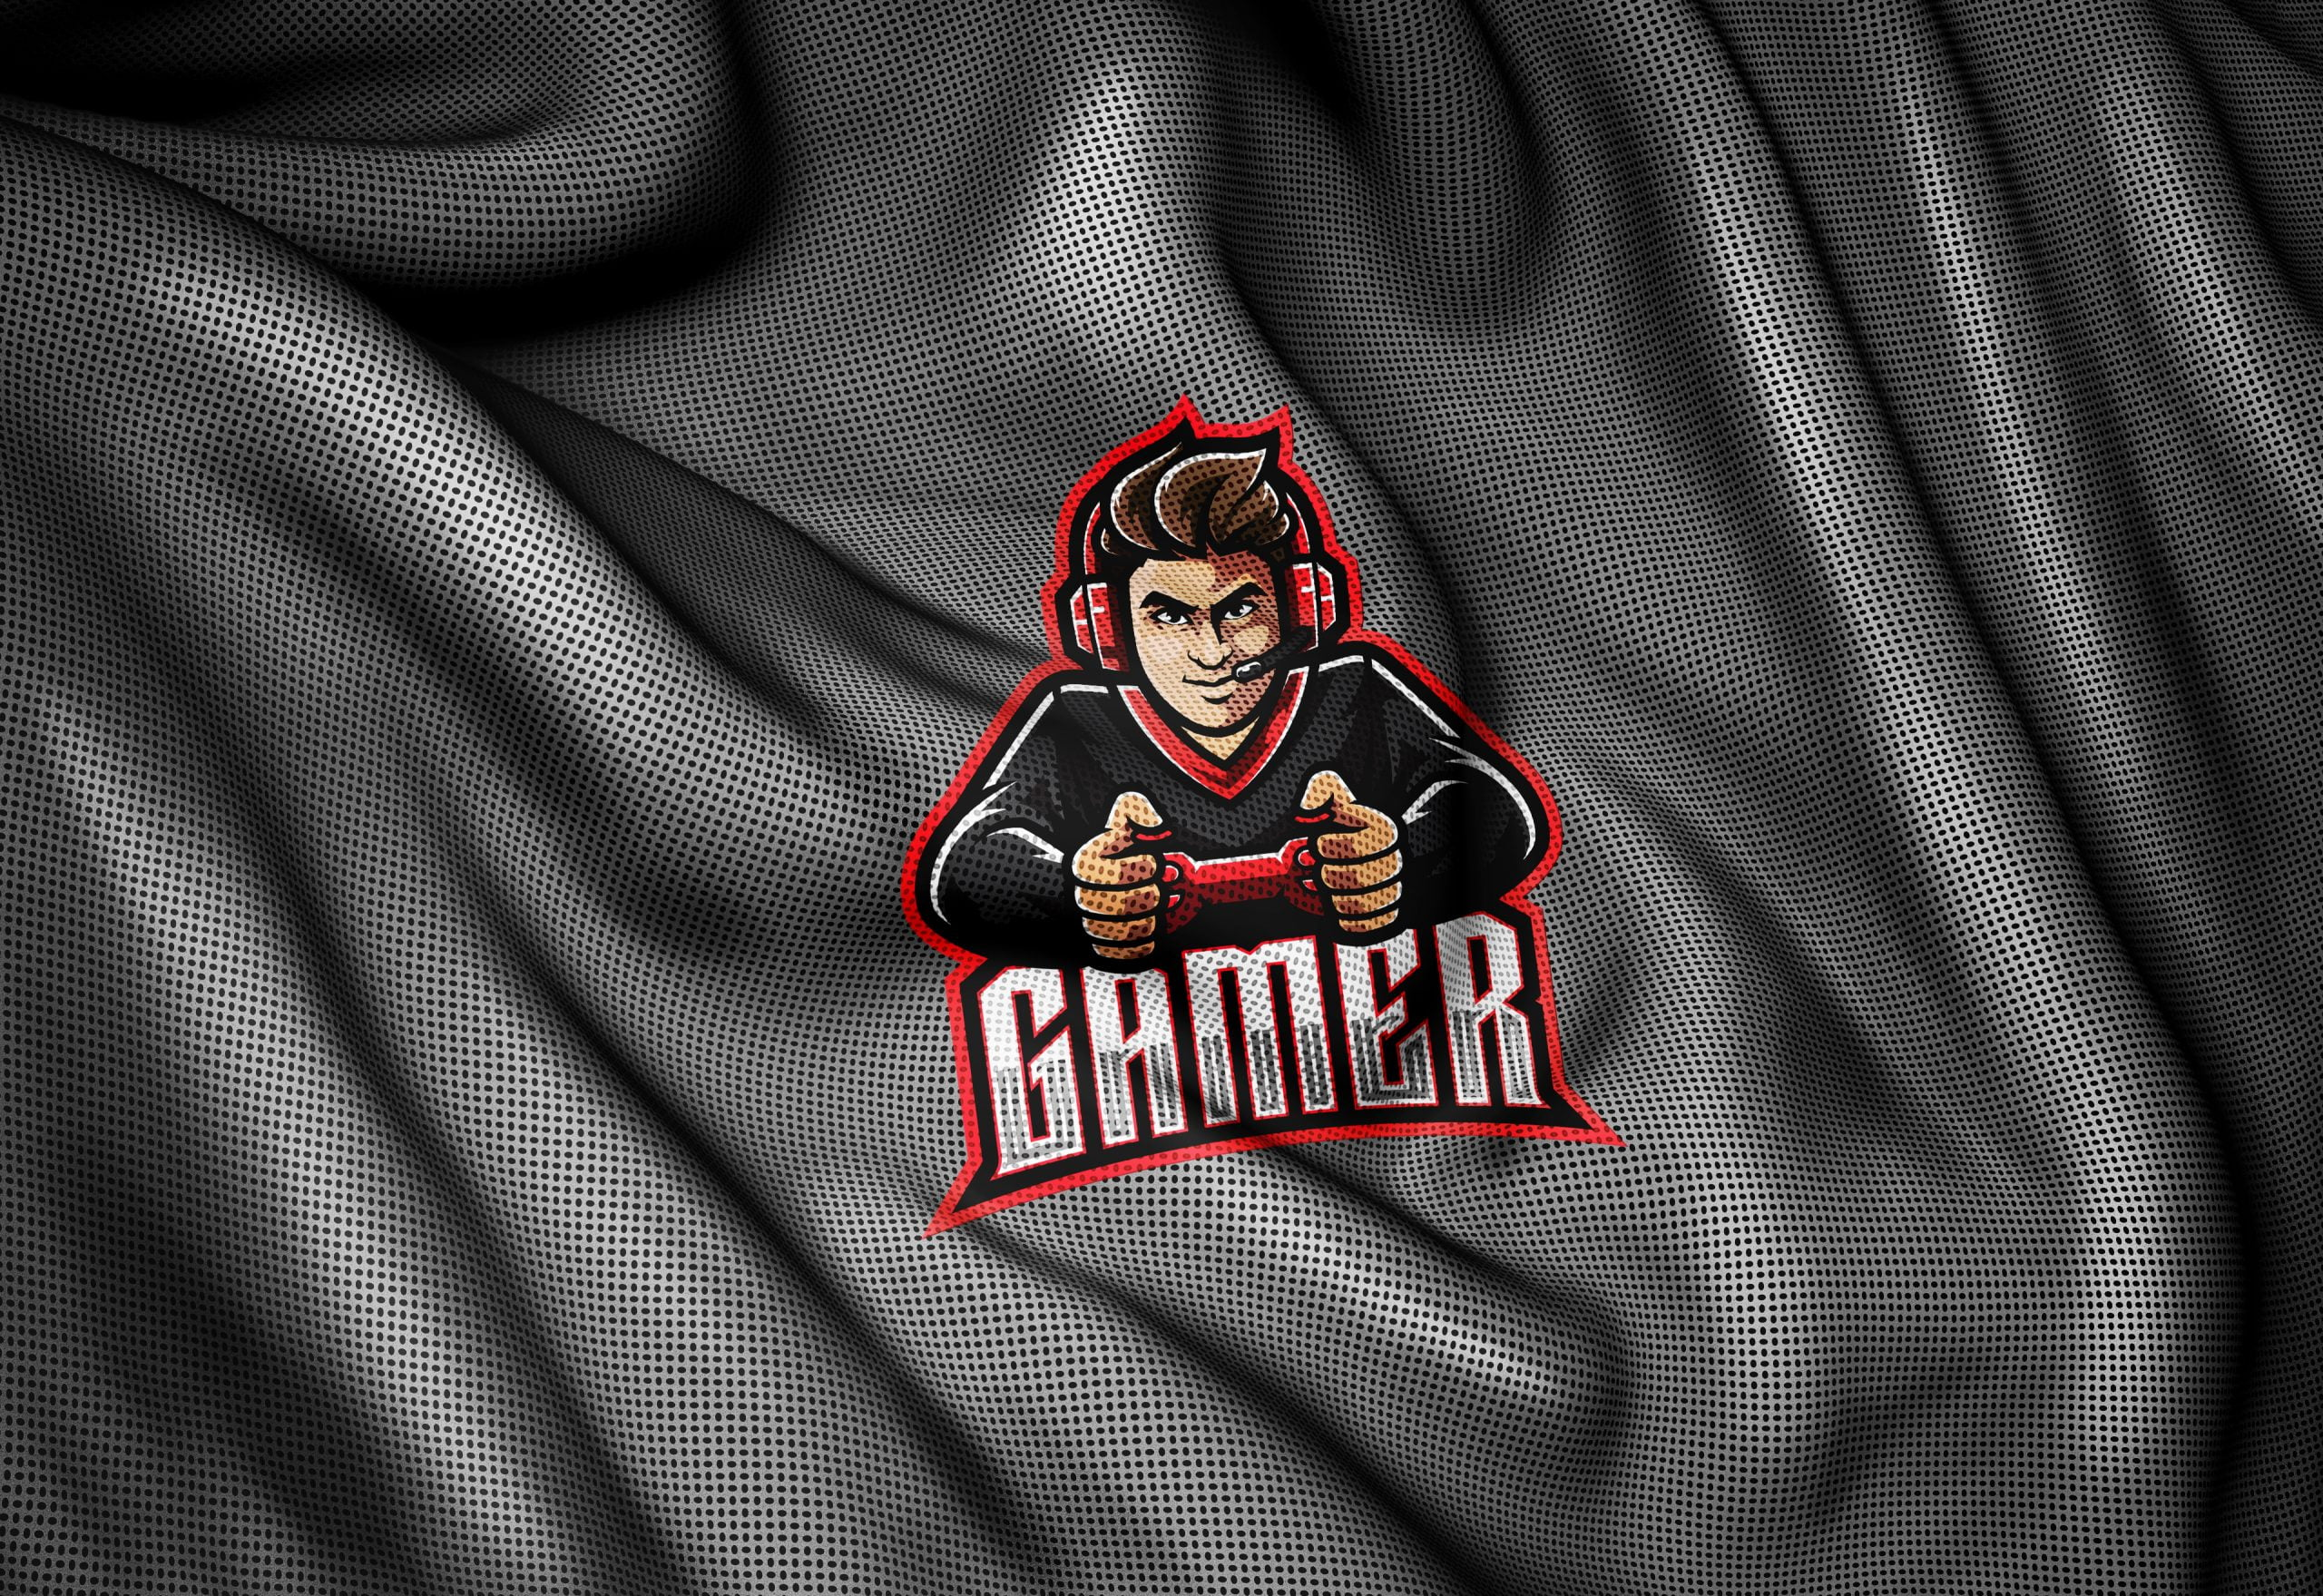 Download-Mascot-Logo-Sports-Jersey-Fabric-Texture-Photoshop-Logo-Mockup